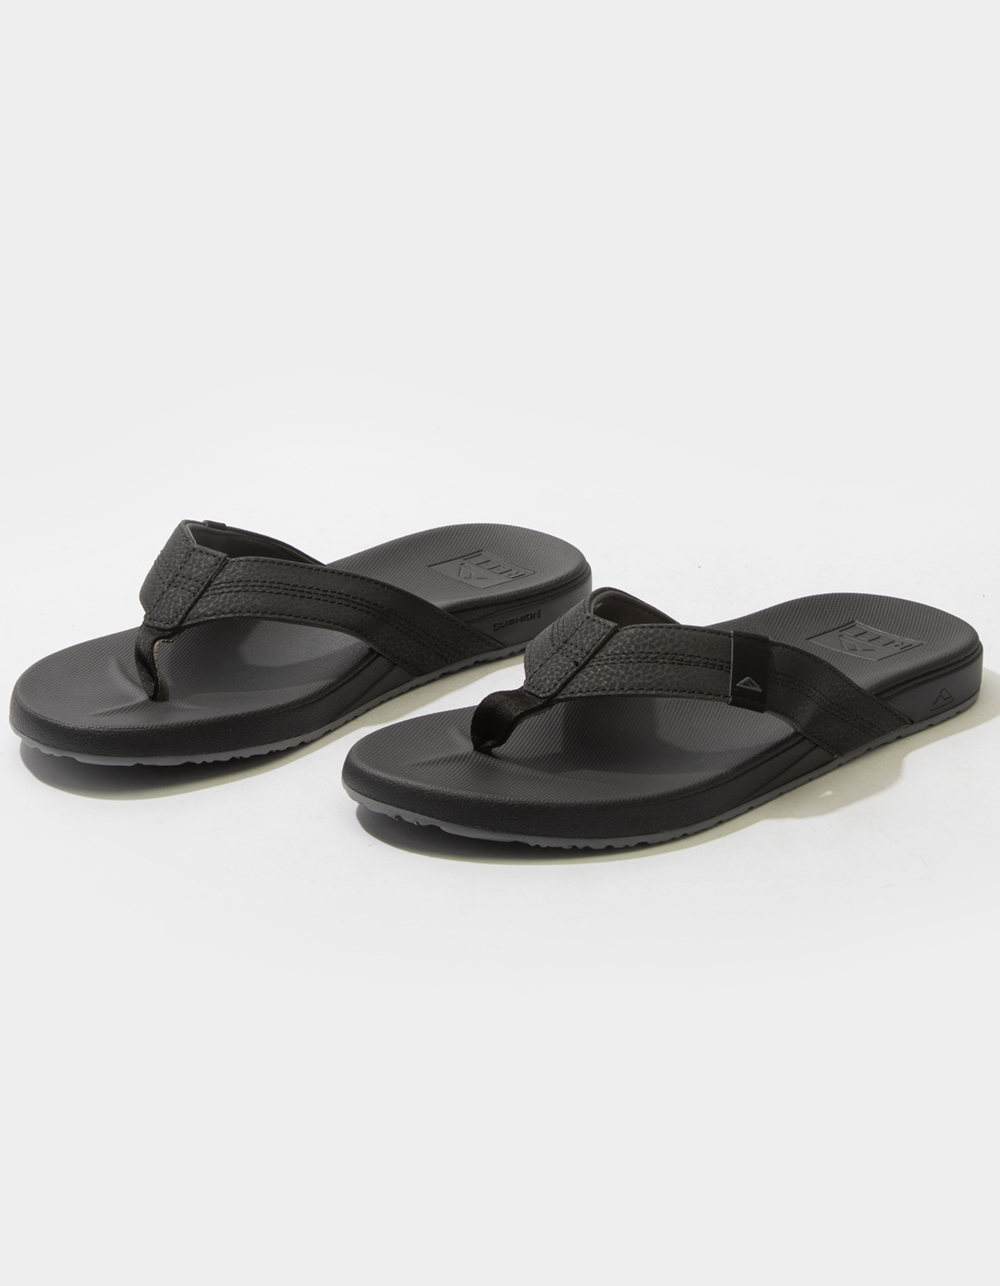 REEF Cushion Bounce Phantom Black Sandals